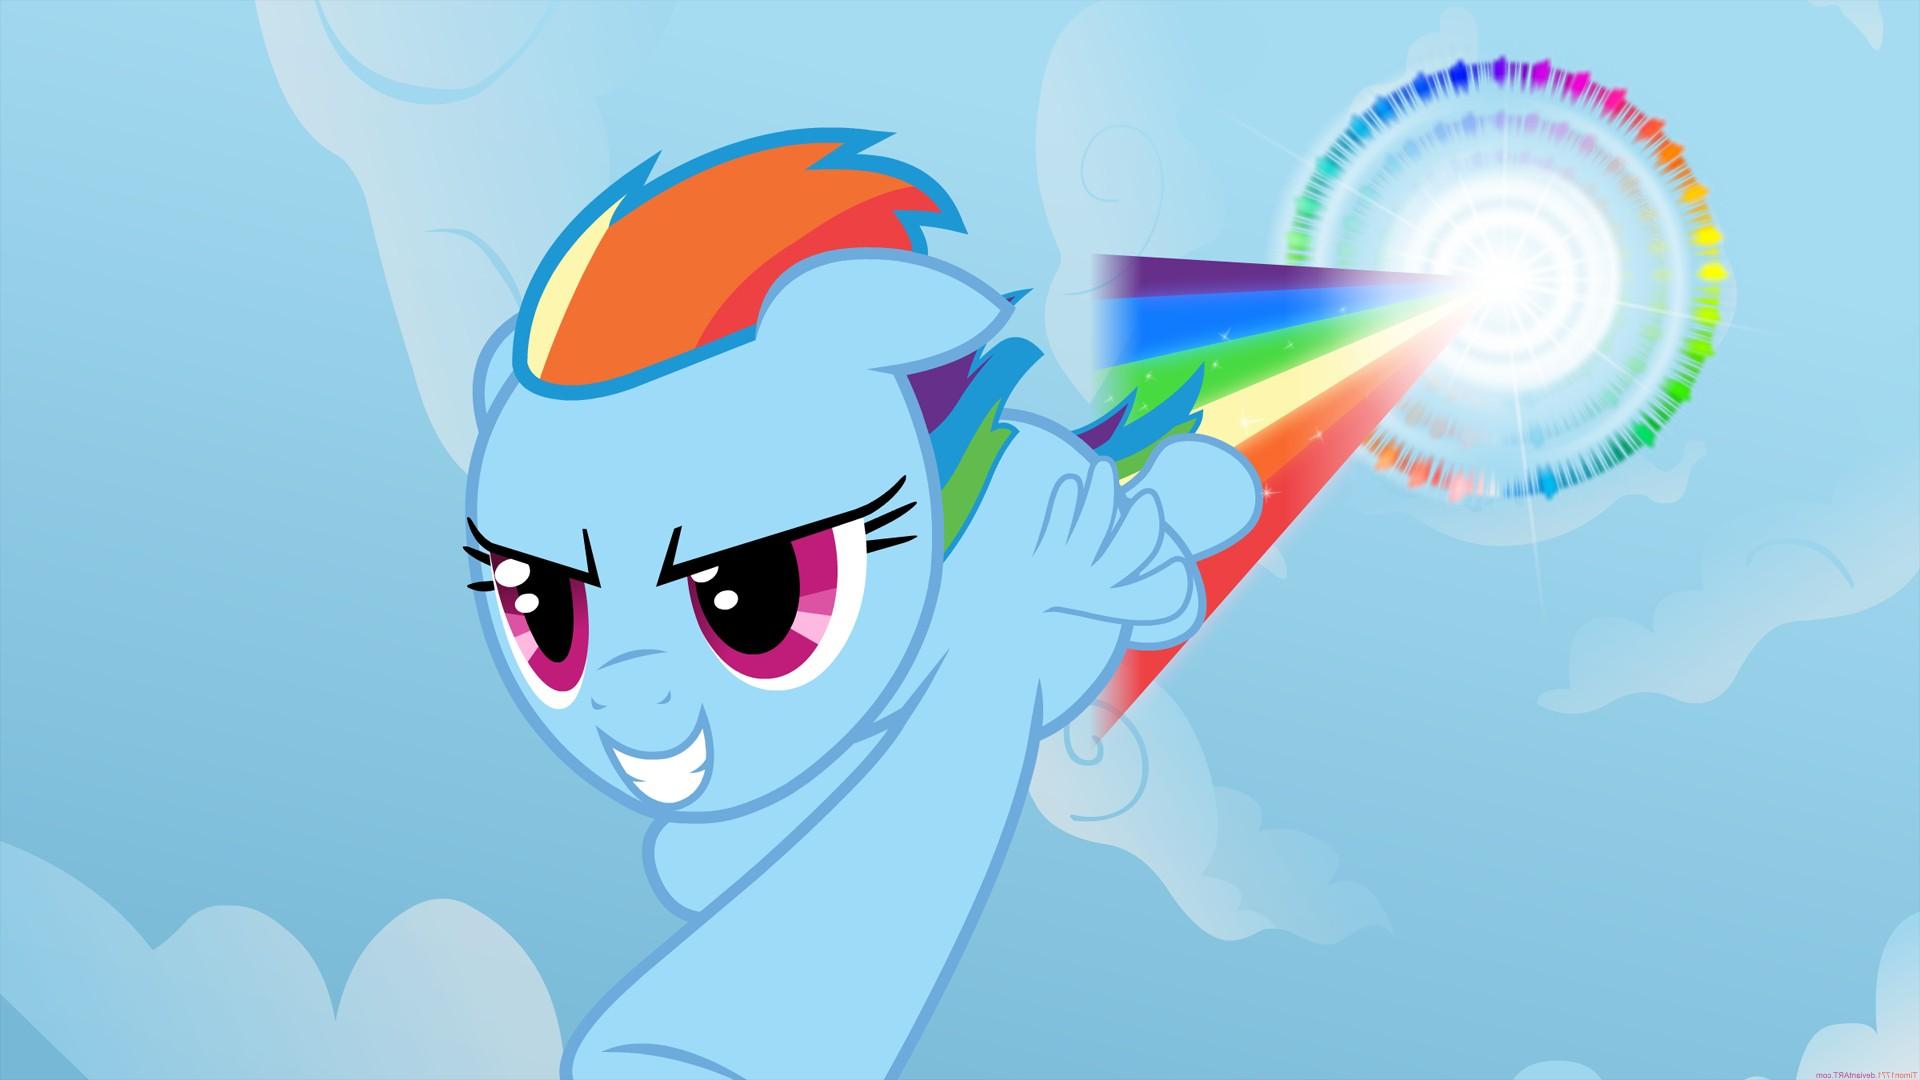 Rainbow Dash does a Sonic Rainboom in style  Blender